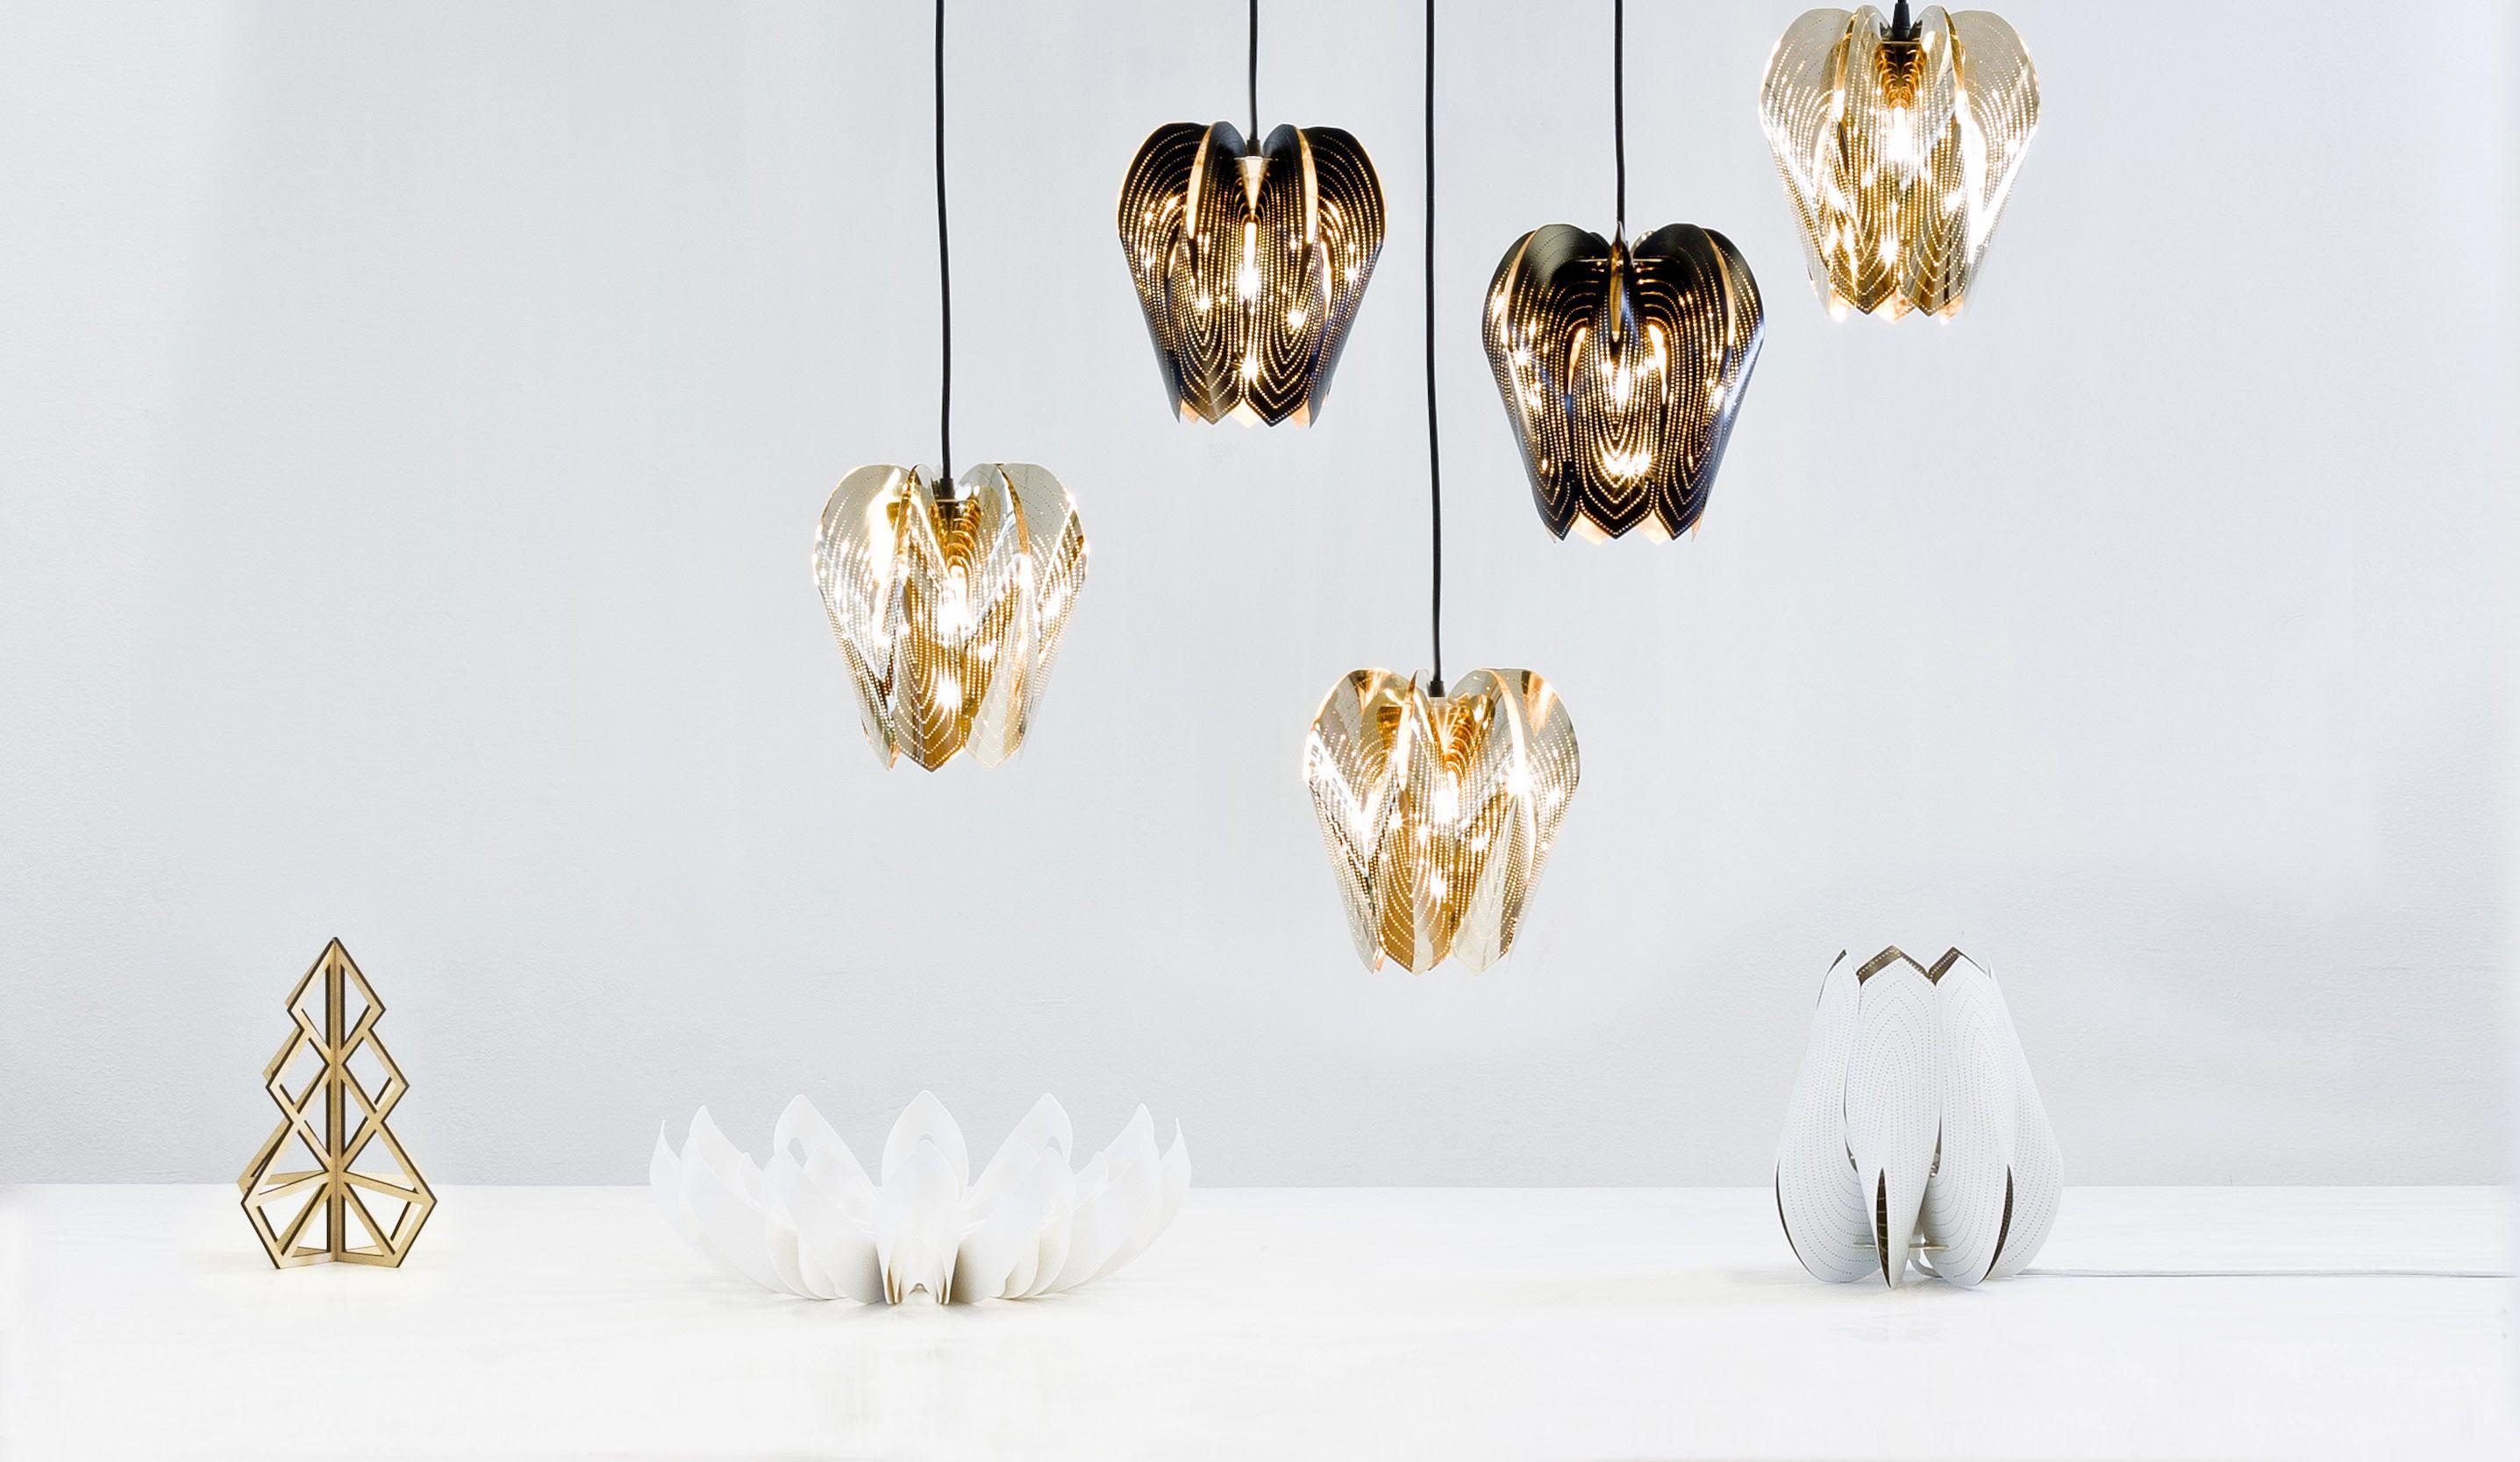 Beandliv – Blossom tealight candle holder, Blossom lamp, Petals decorative fruit bowl. #habitare2014 #design #sisustus #messut #helsinki #messukeskus